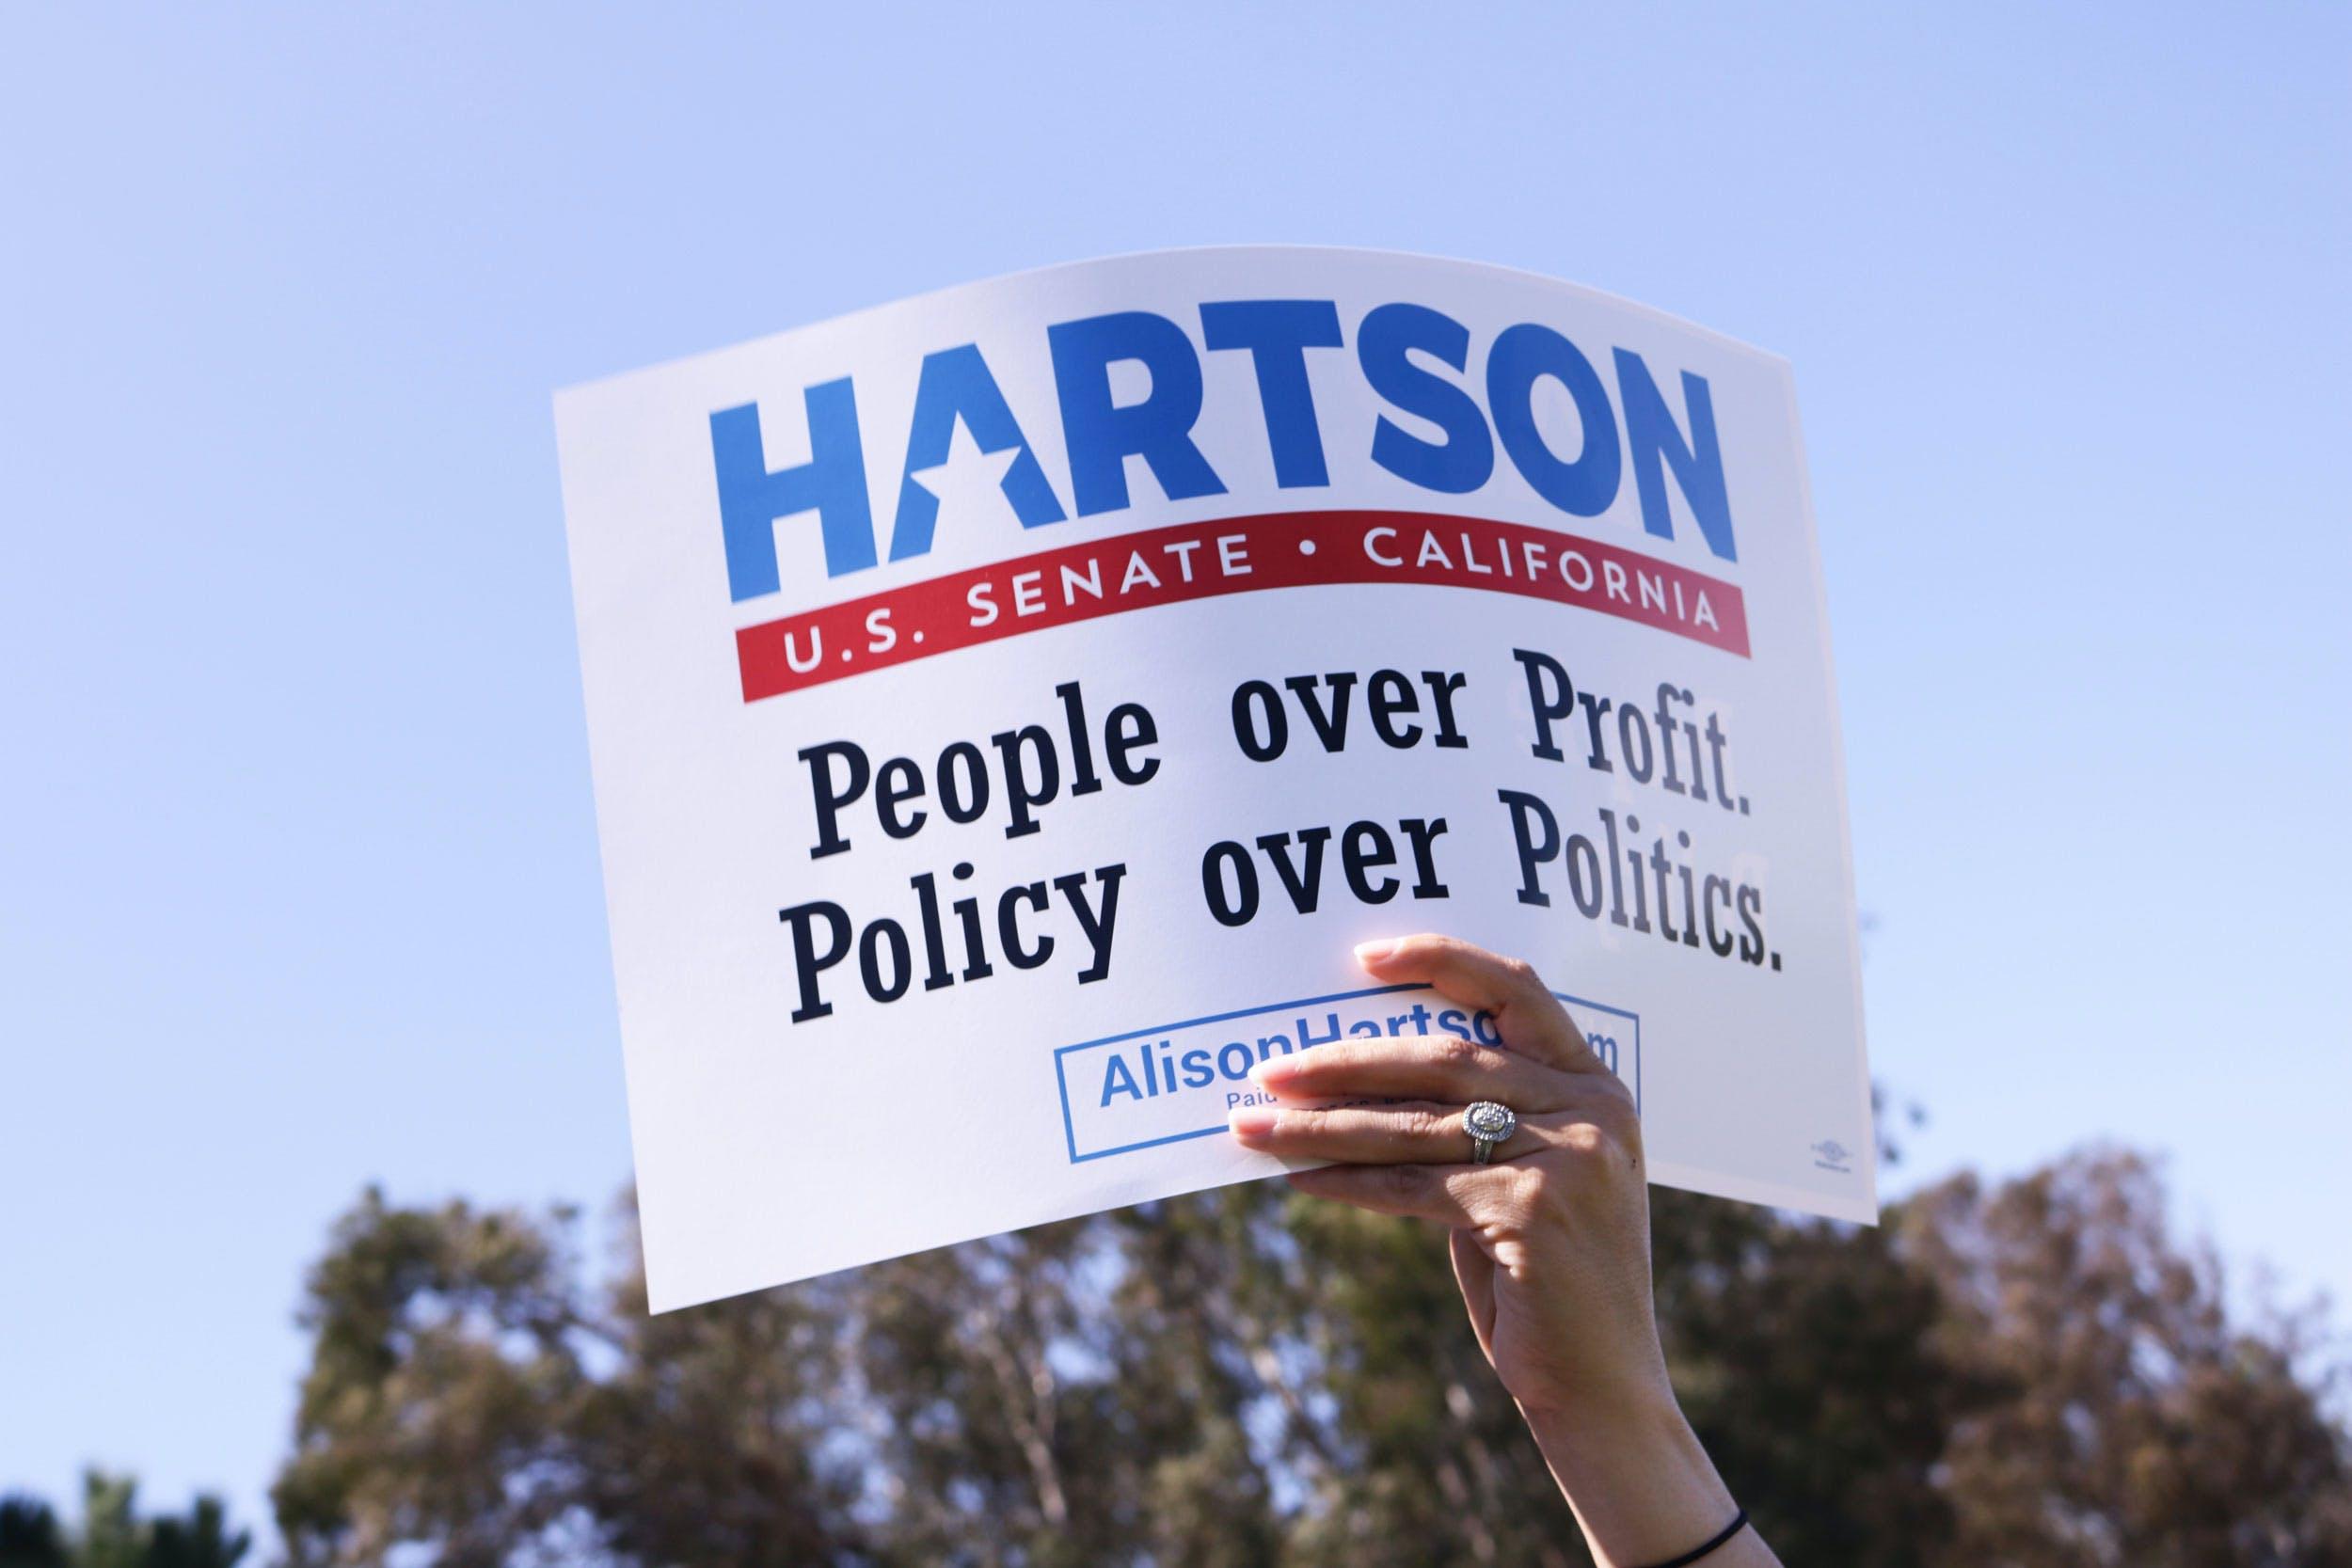 Pro cannabis Senate candidate Alison Hartson left out of polls in California Congress Blocks Recreational Marijuana Sales In Washington, D.C.